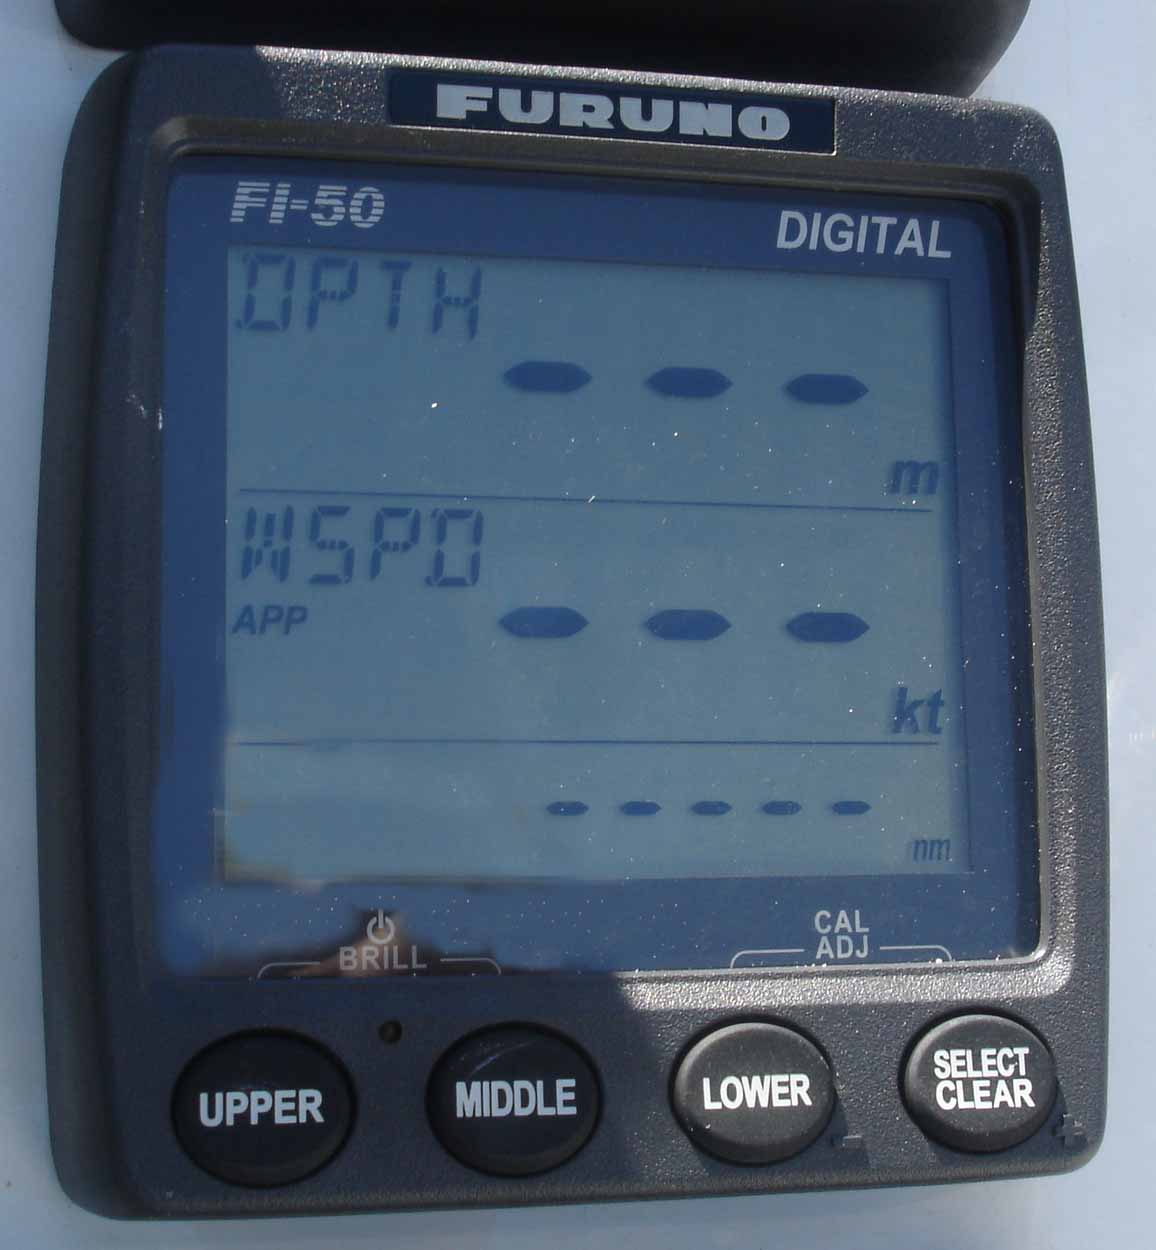 Click image for larger version  Name:Furuno log.JPG Views:78 Size:102.6 KB ID:15078